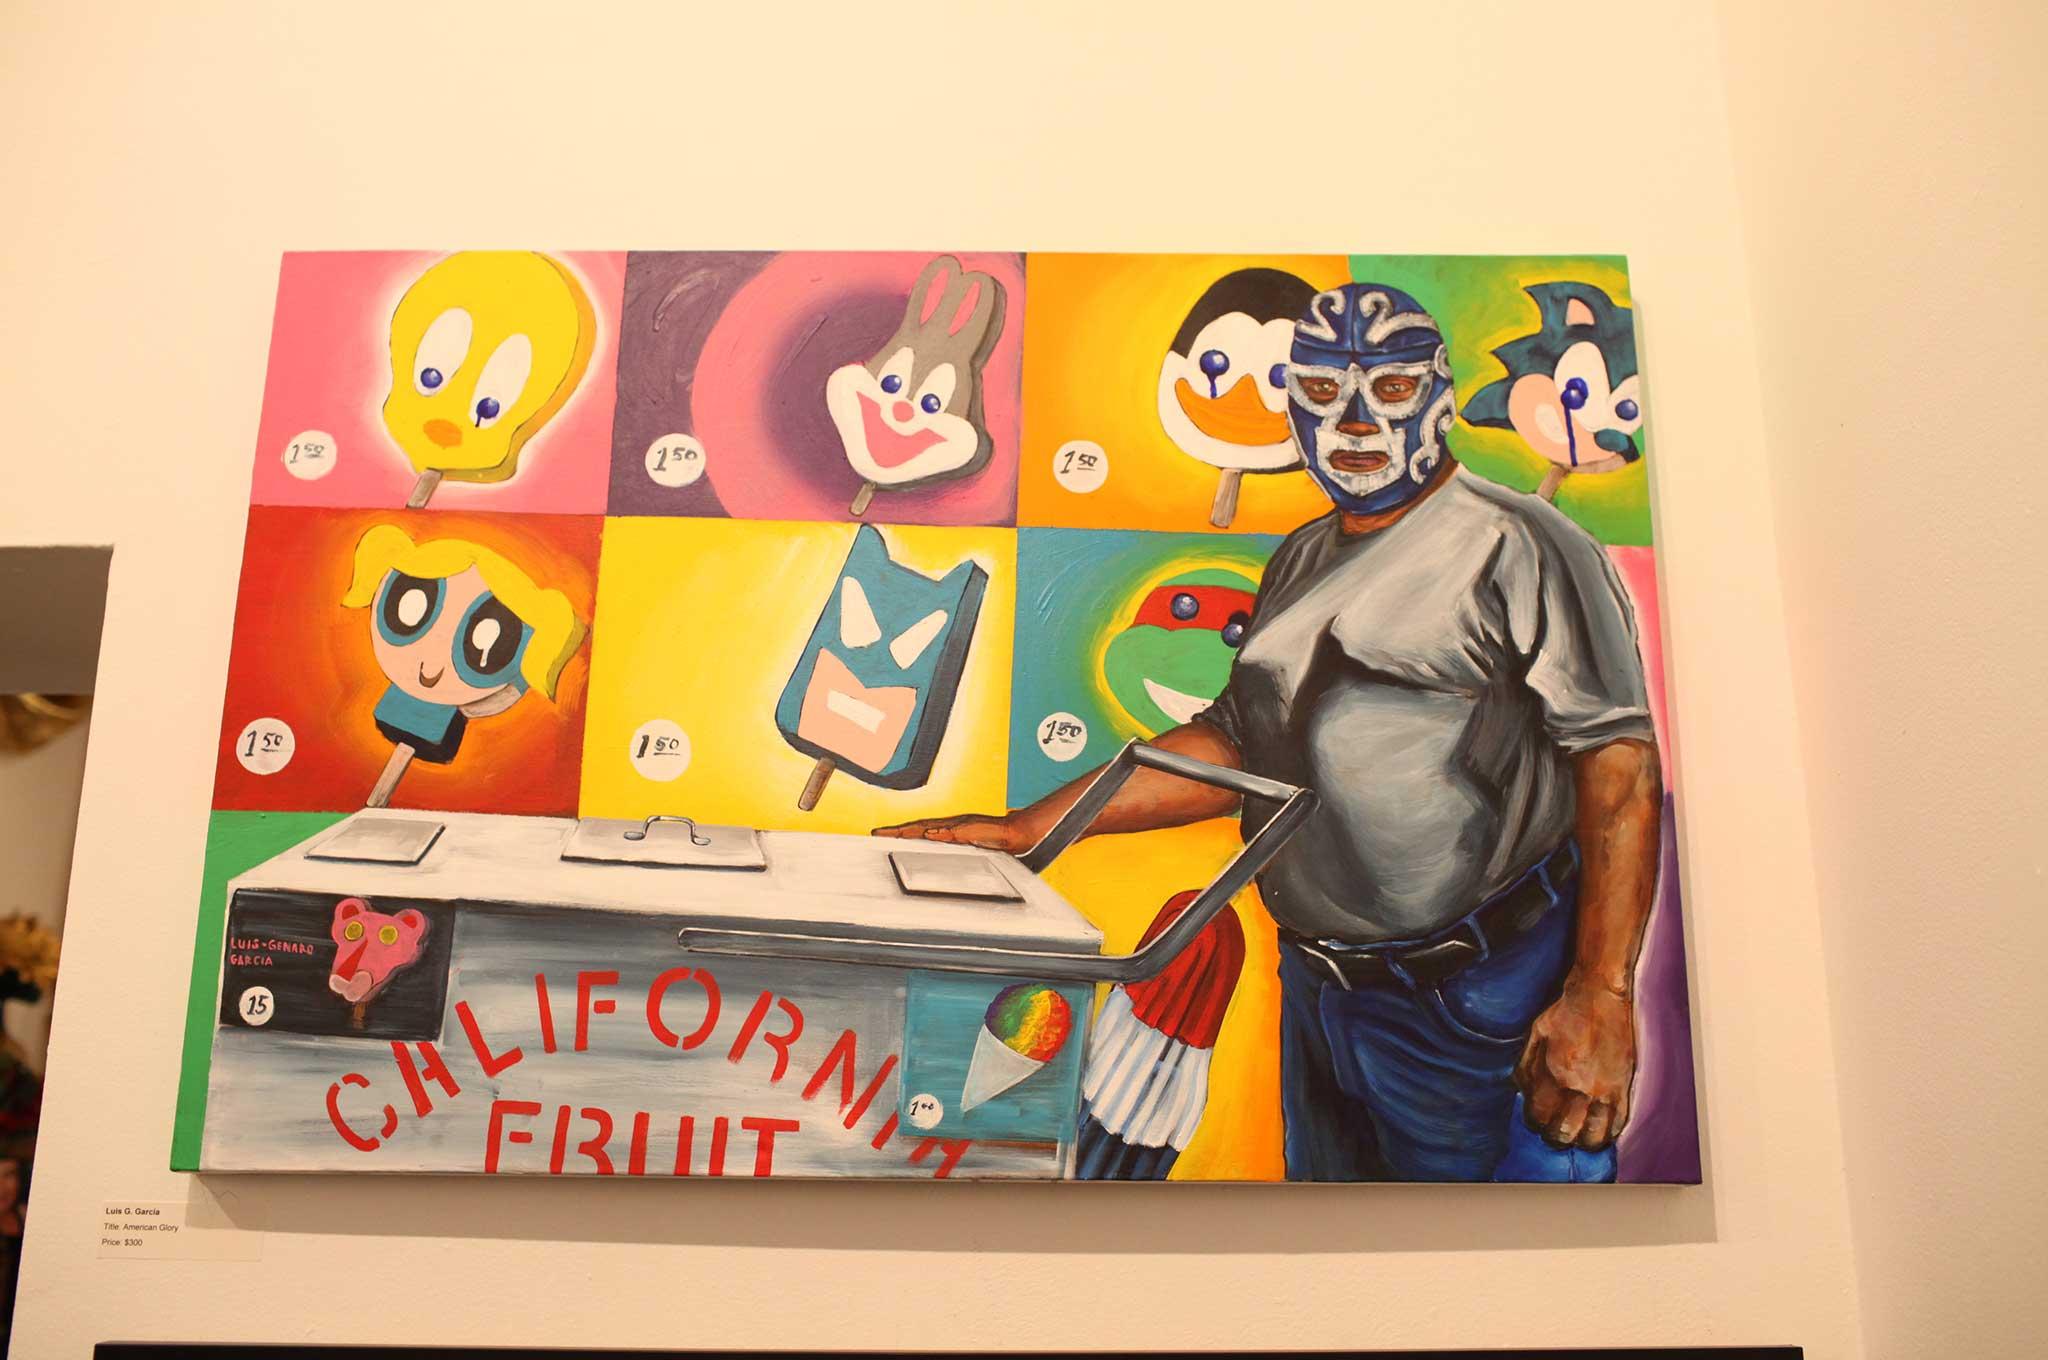 022 2015 la bulla art exhibition artwork